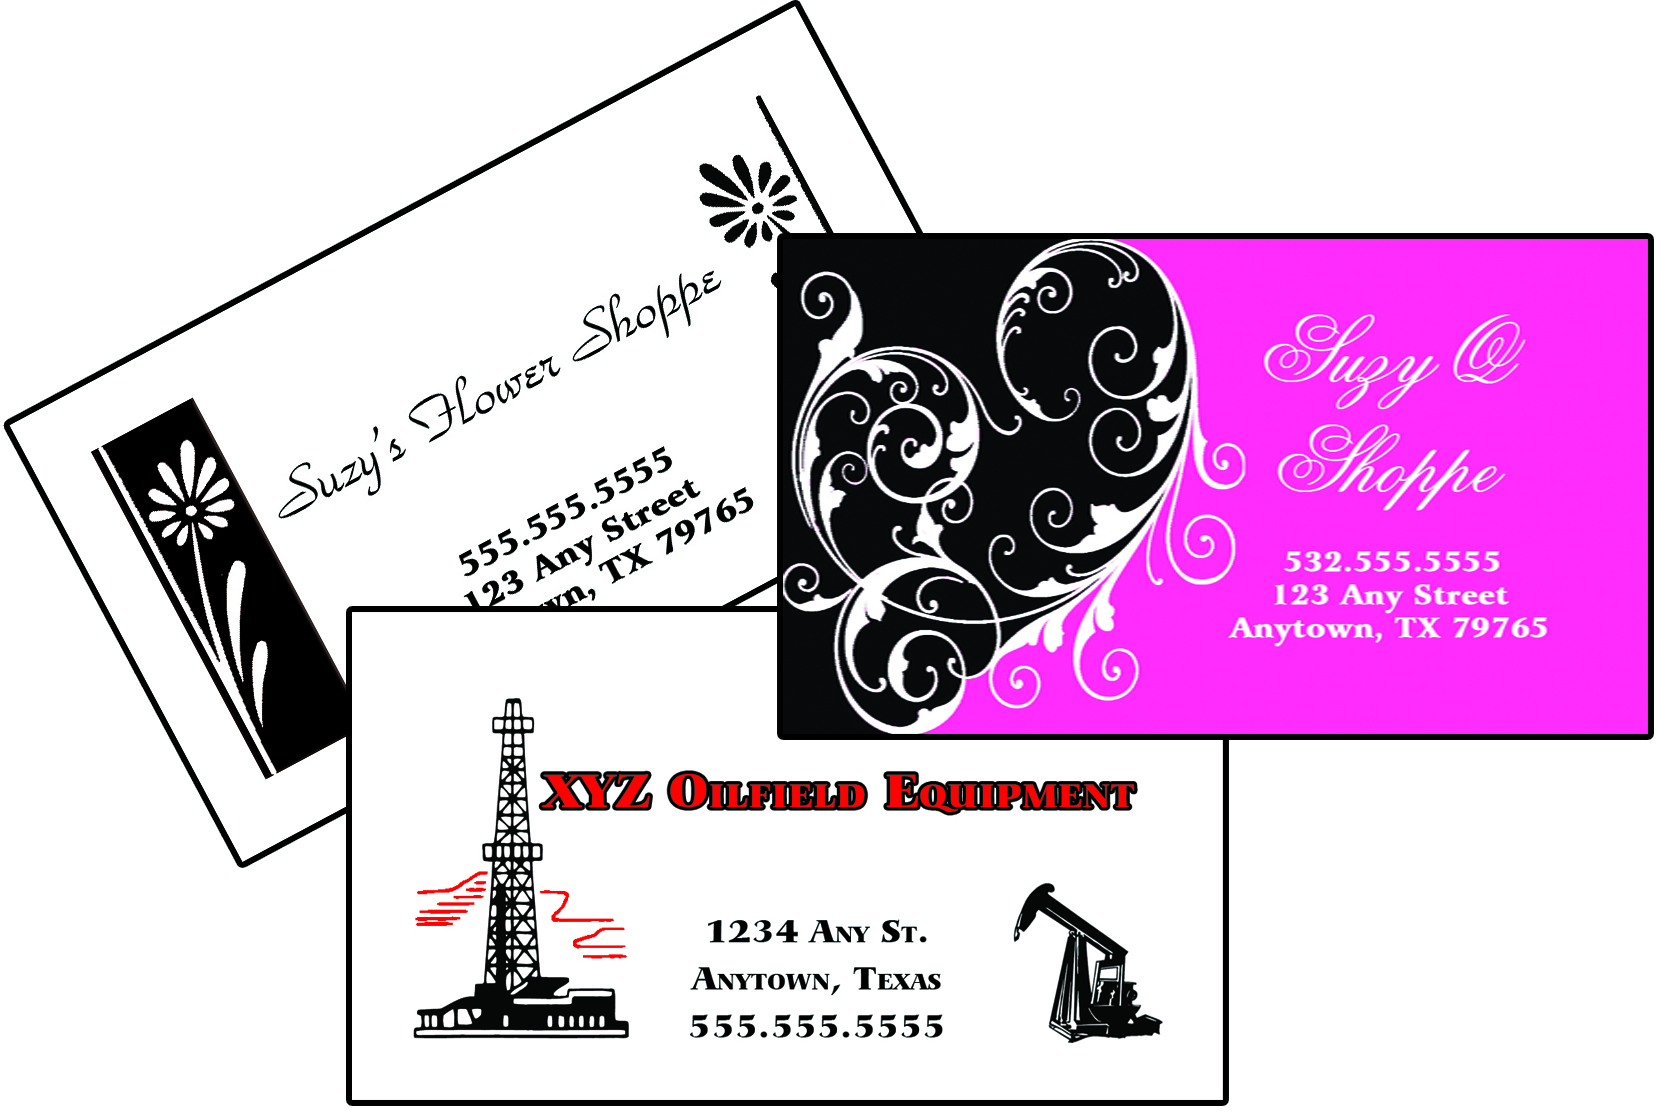 business cards odessa, tx